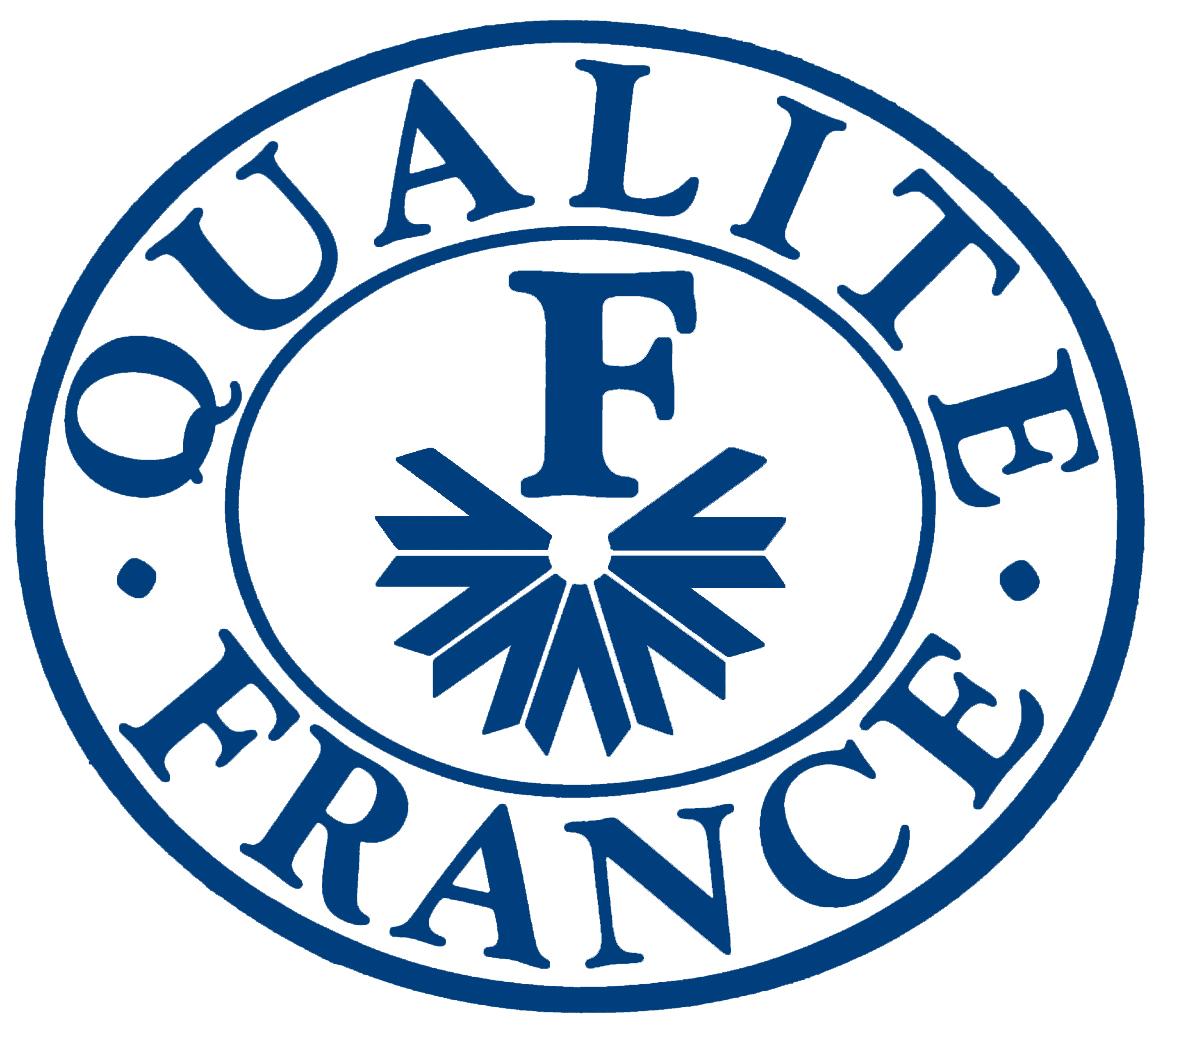 logo qualité france.jpg